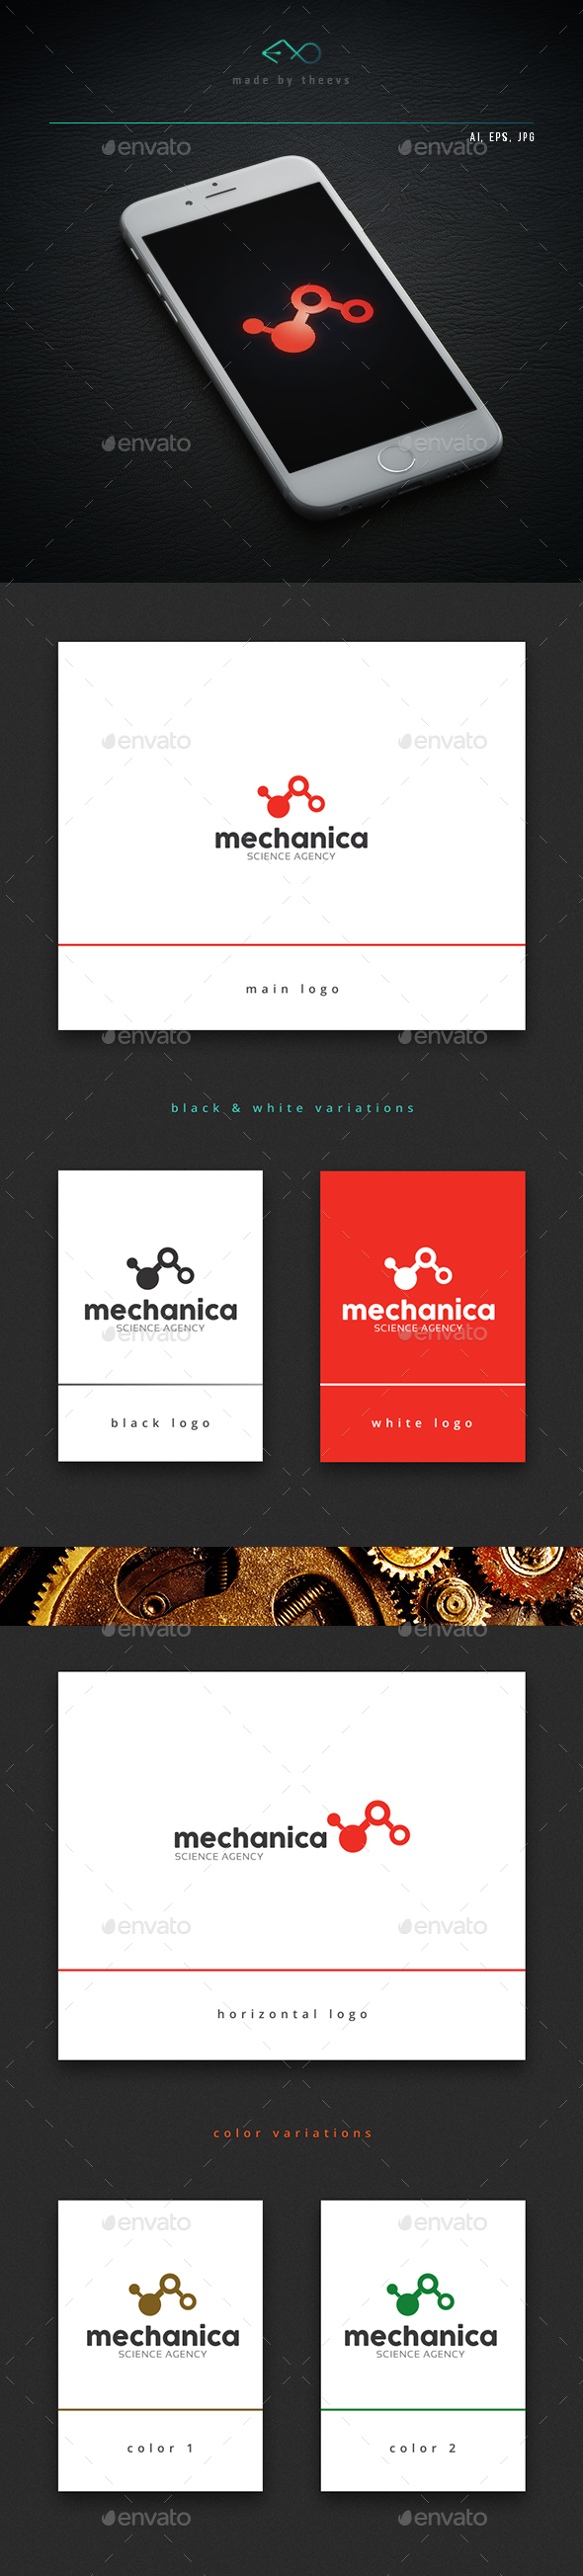 Mechanica - Vector Abstract